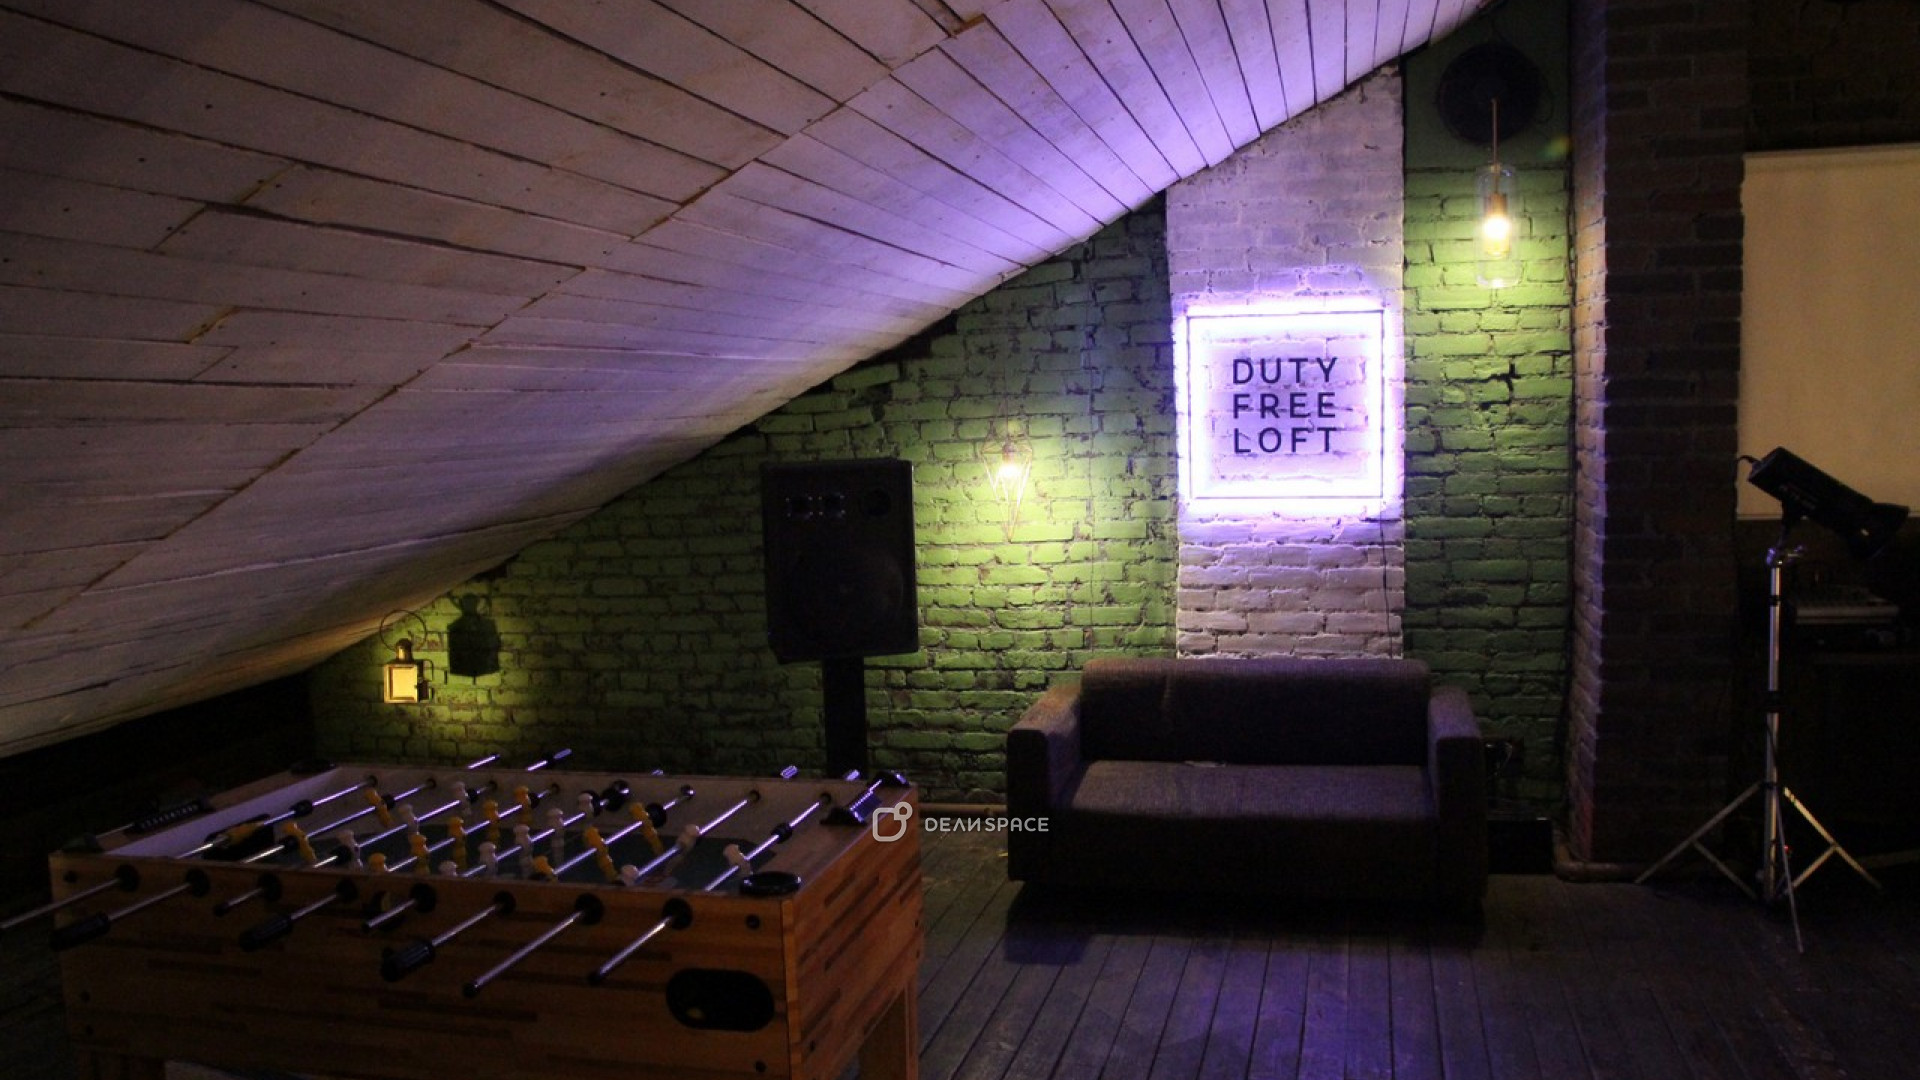 Duty Free Loft - фото №4